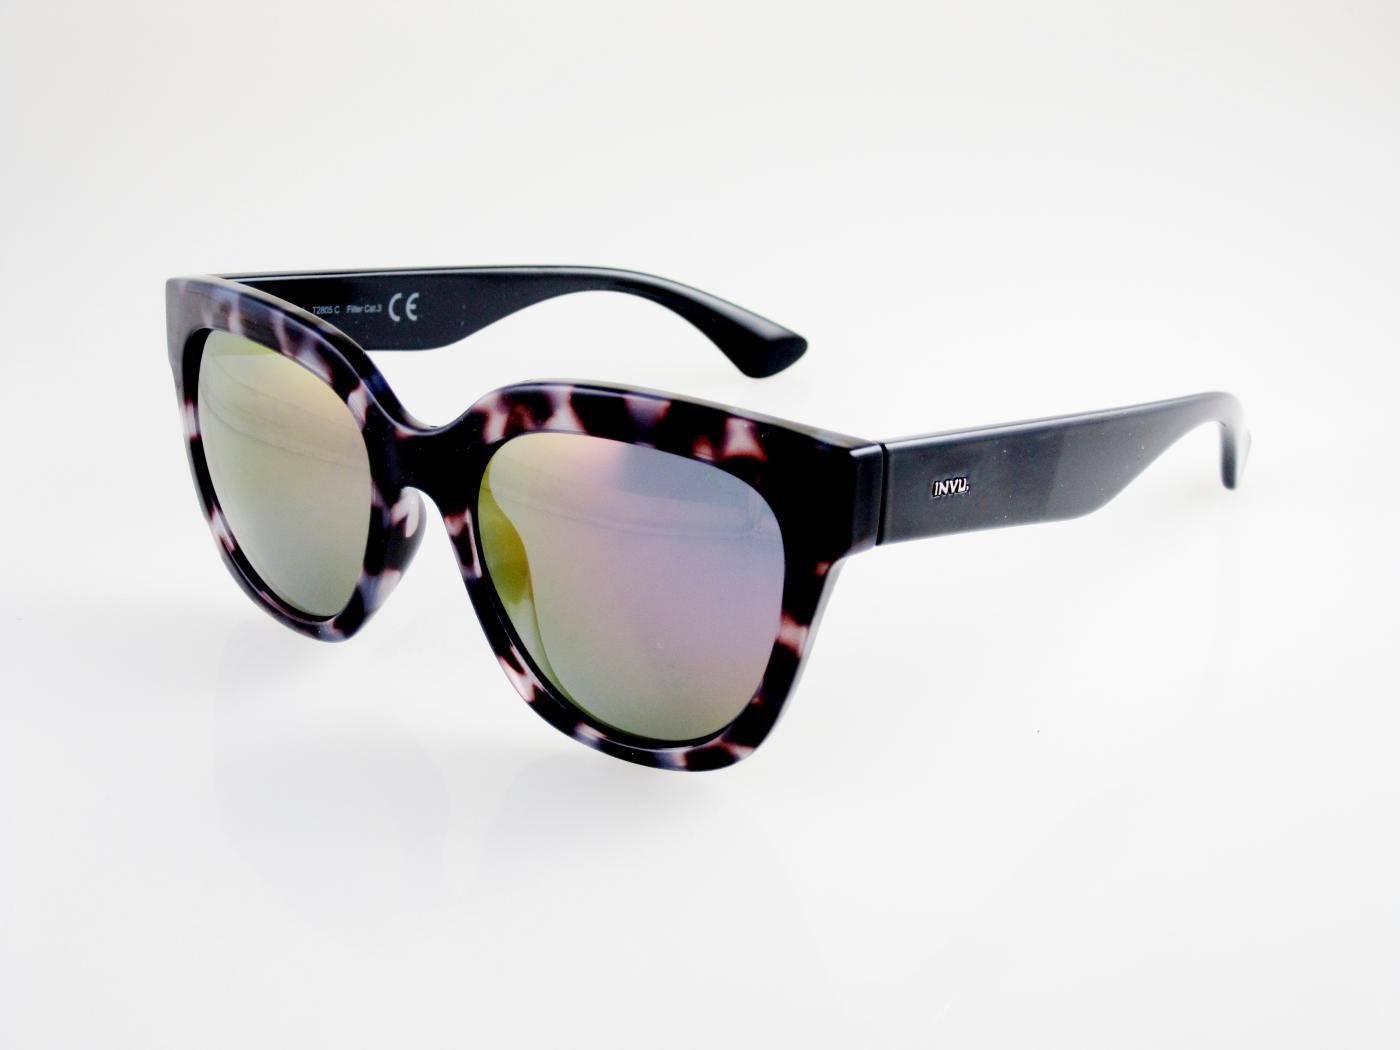 Dámske slnečné okuliare INVU - Trend Collection 4fe09ec3541